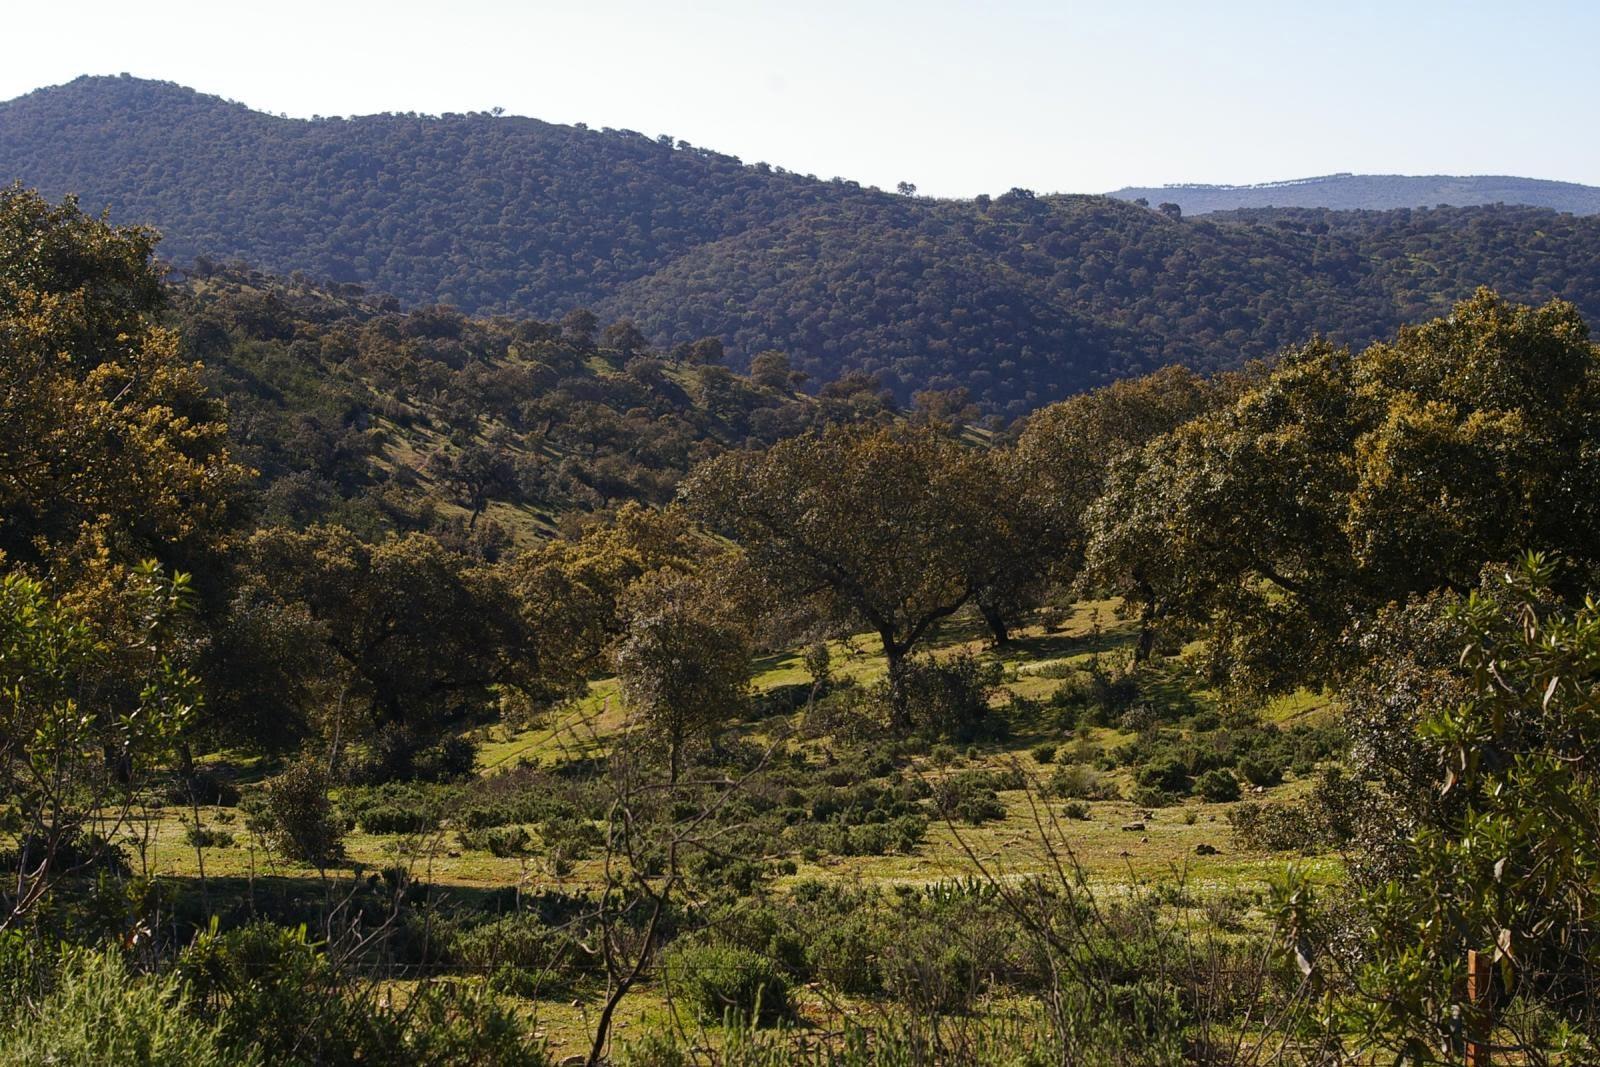 Primero de sociales paisaje mediterr neo for Arboles de hoja perenne para clima mediterraneo